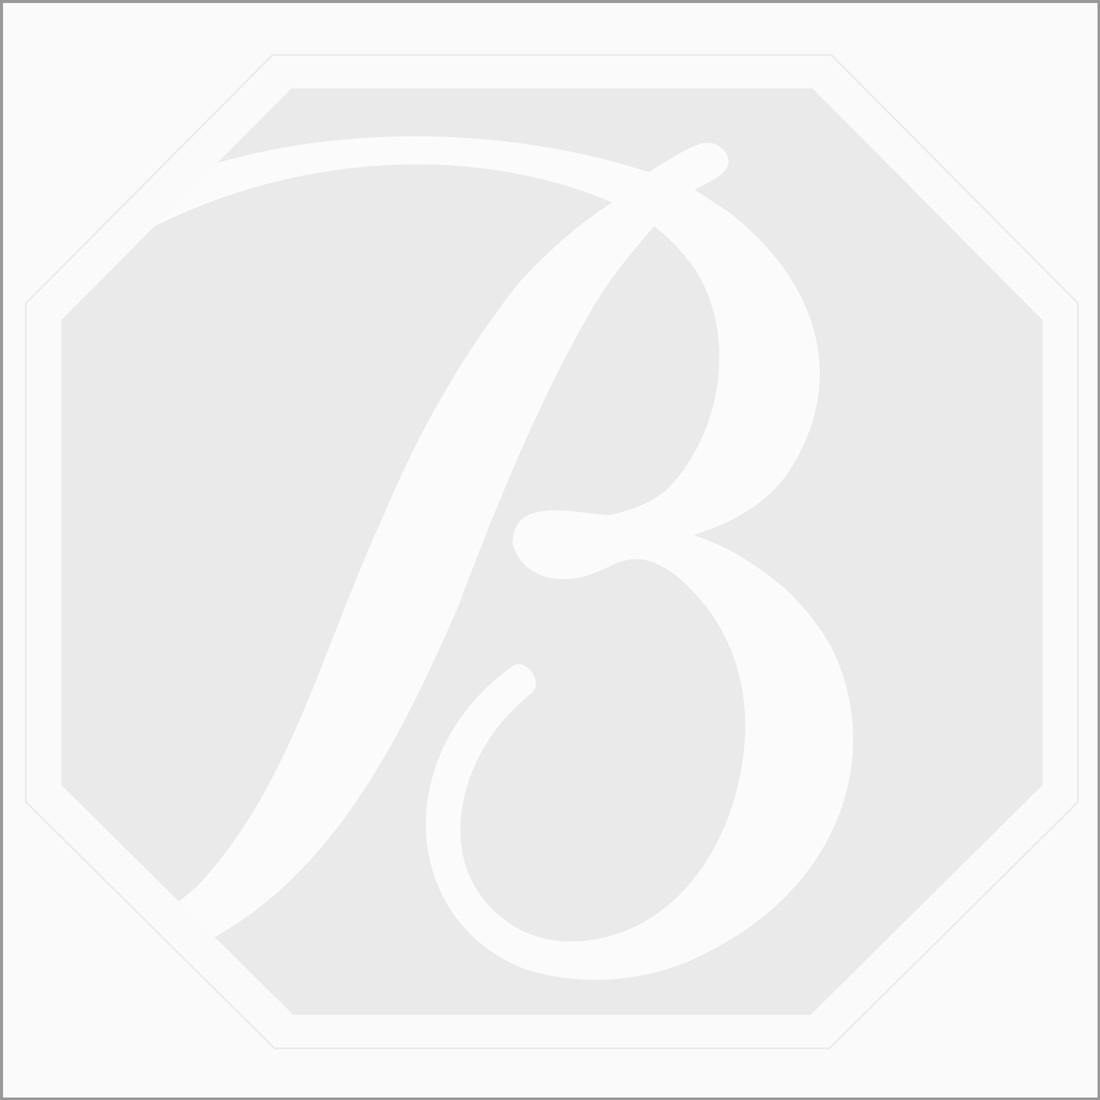 0.58 ct. Oval (H-VVS2) White Rose Cut Diamond Photograph